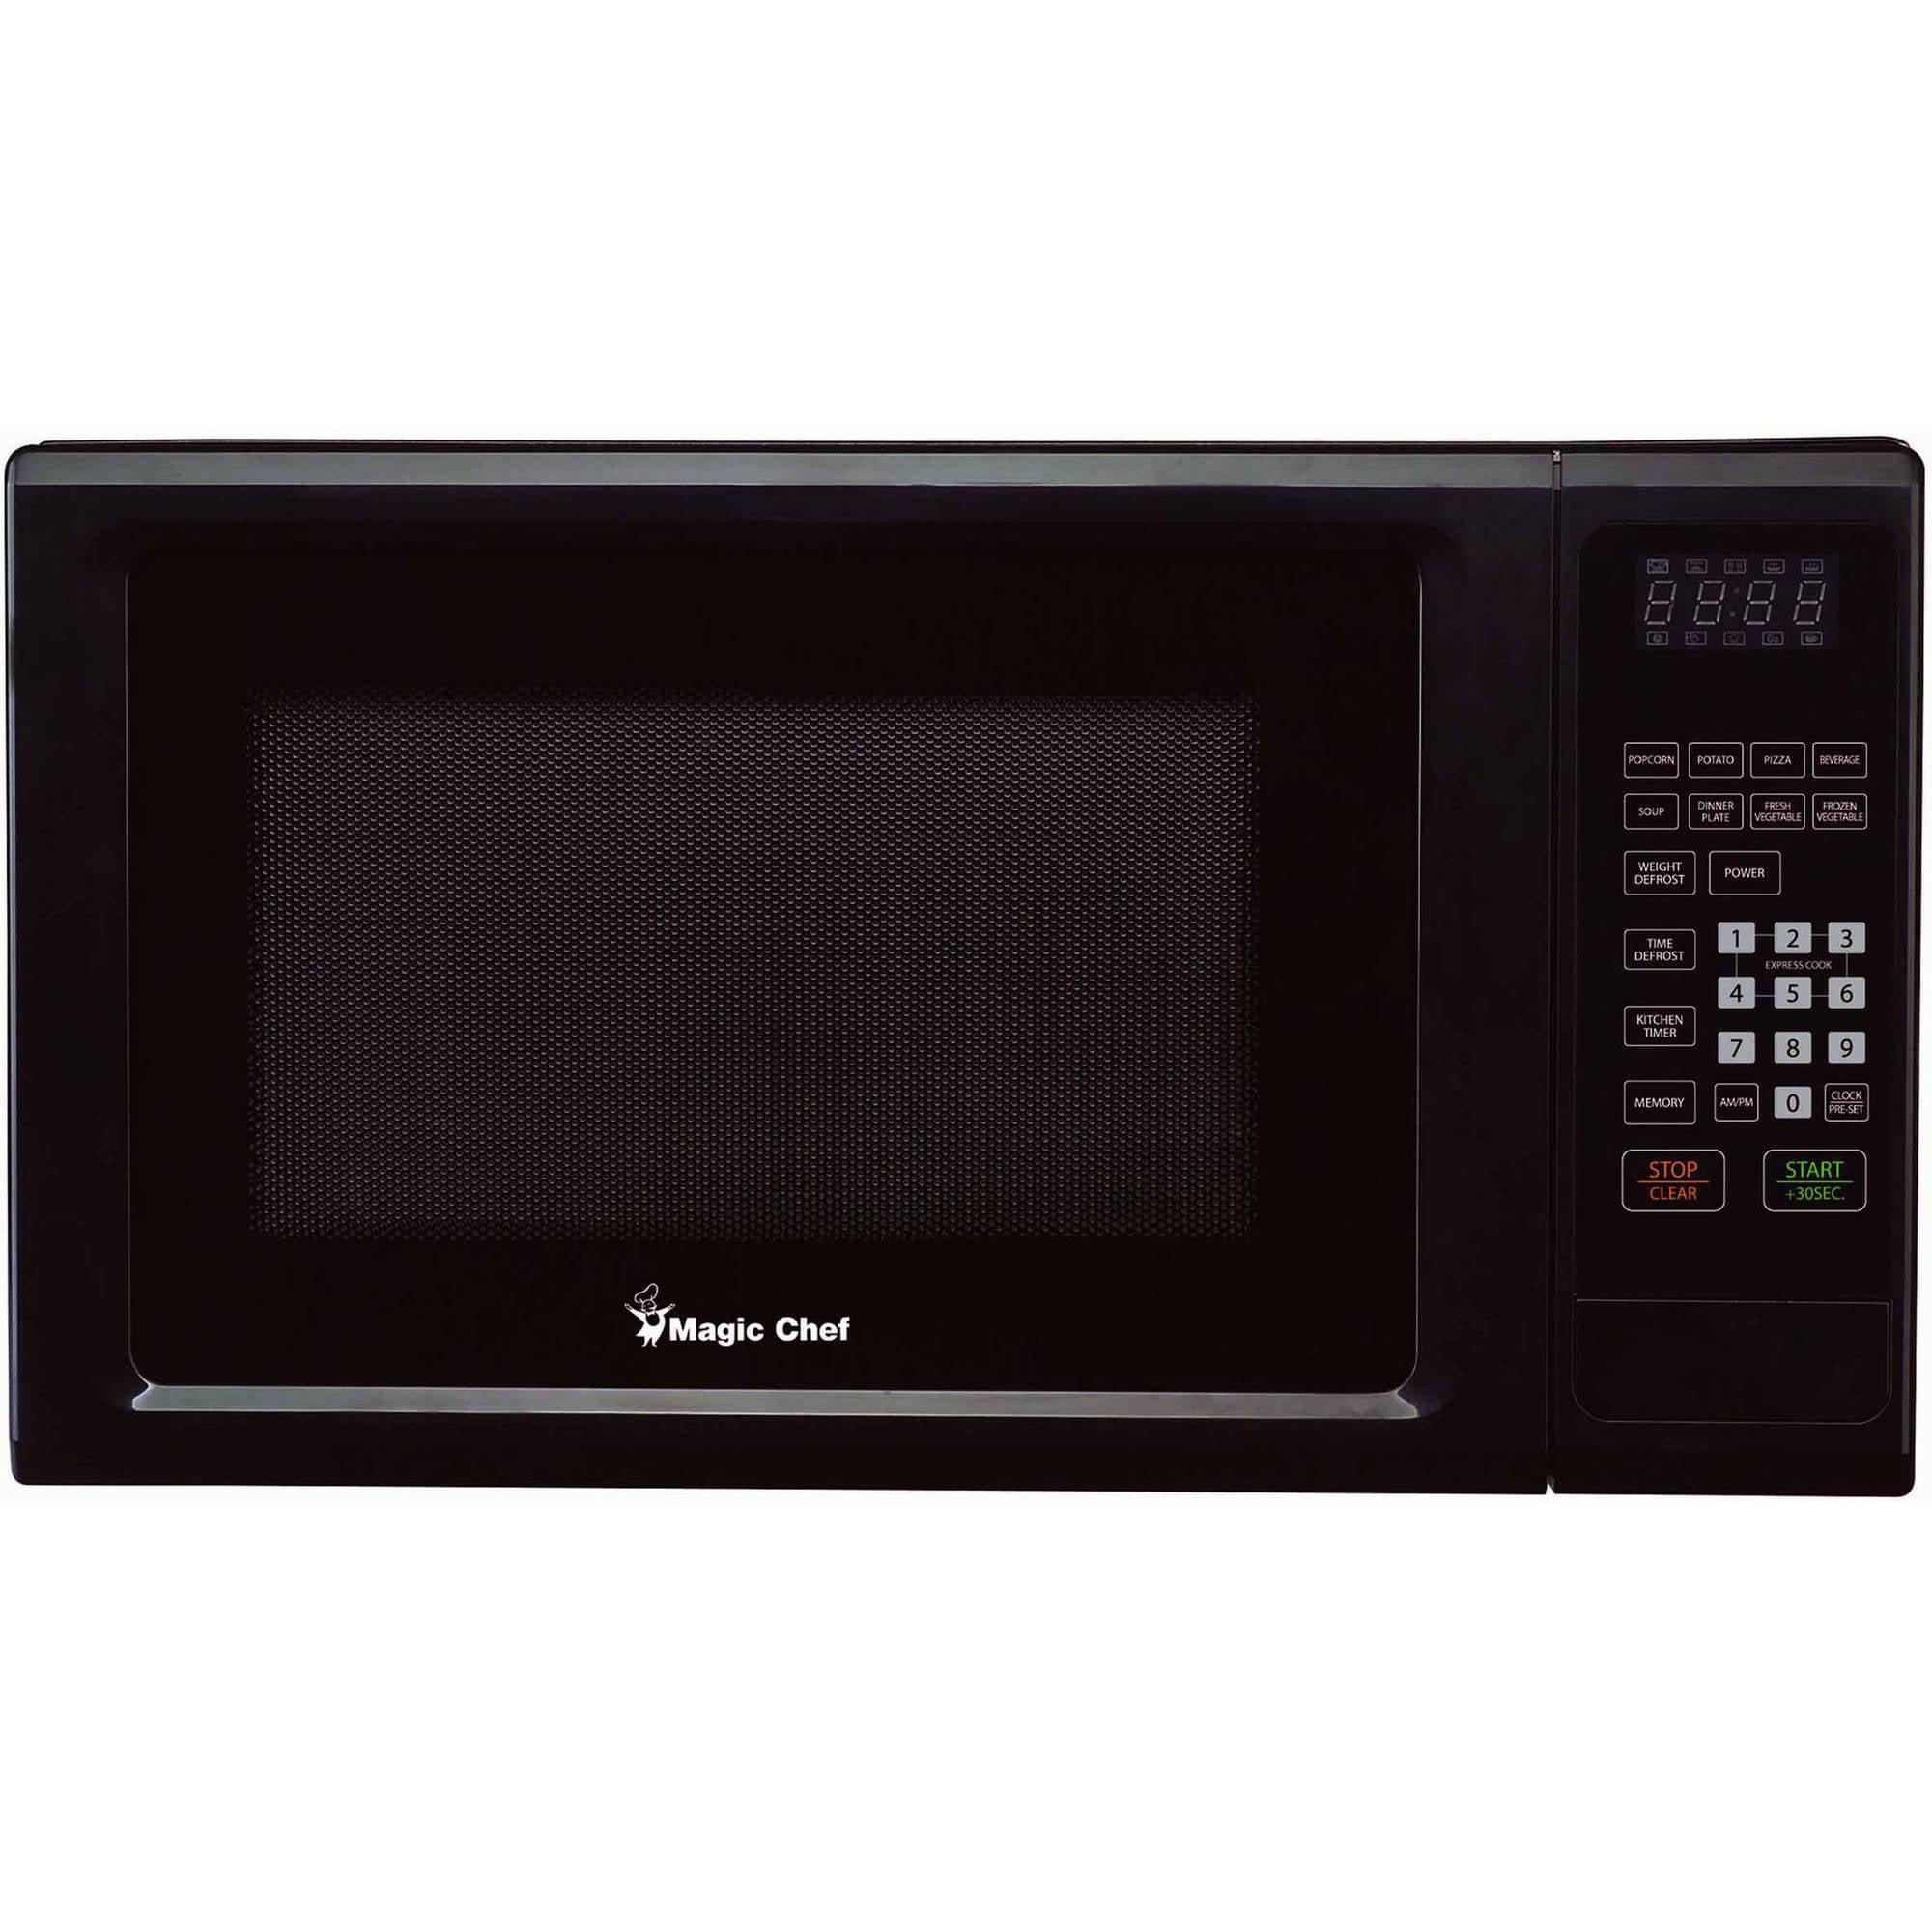 Magic Chef Kitchen Appliances Magic Chef 11 Cu Ft Microwave Walmartcom